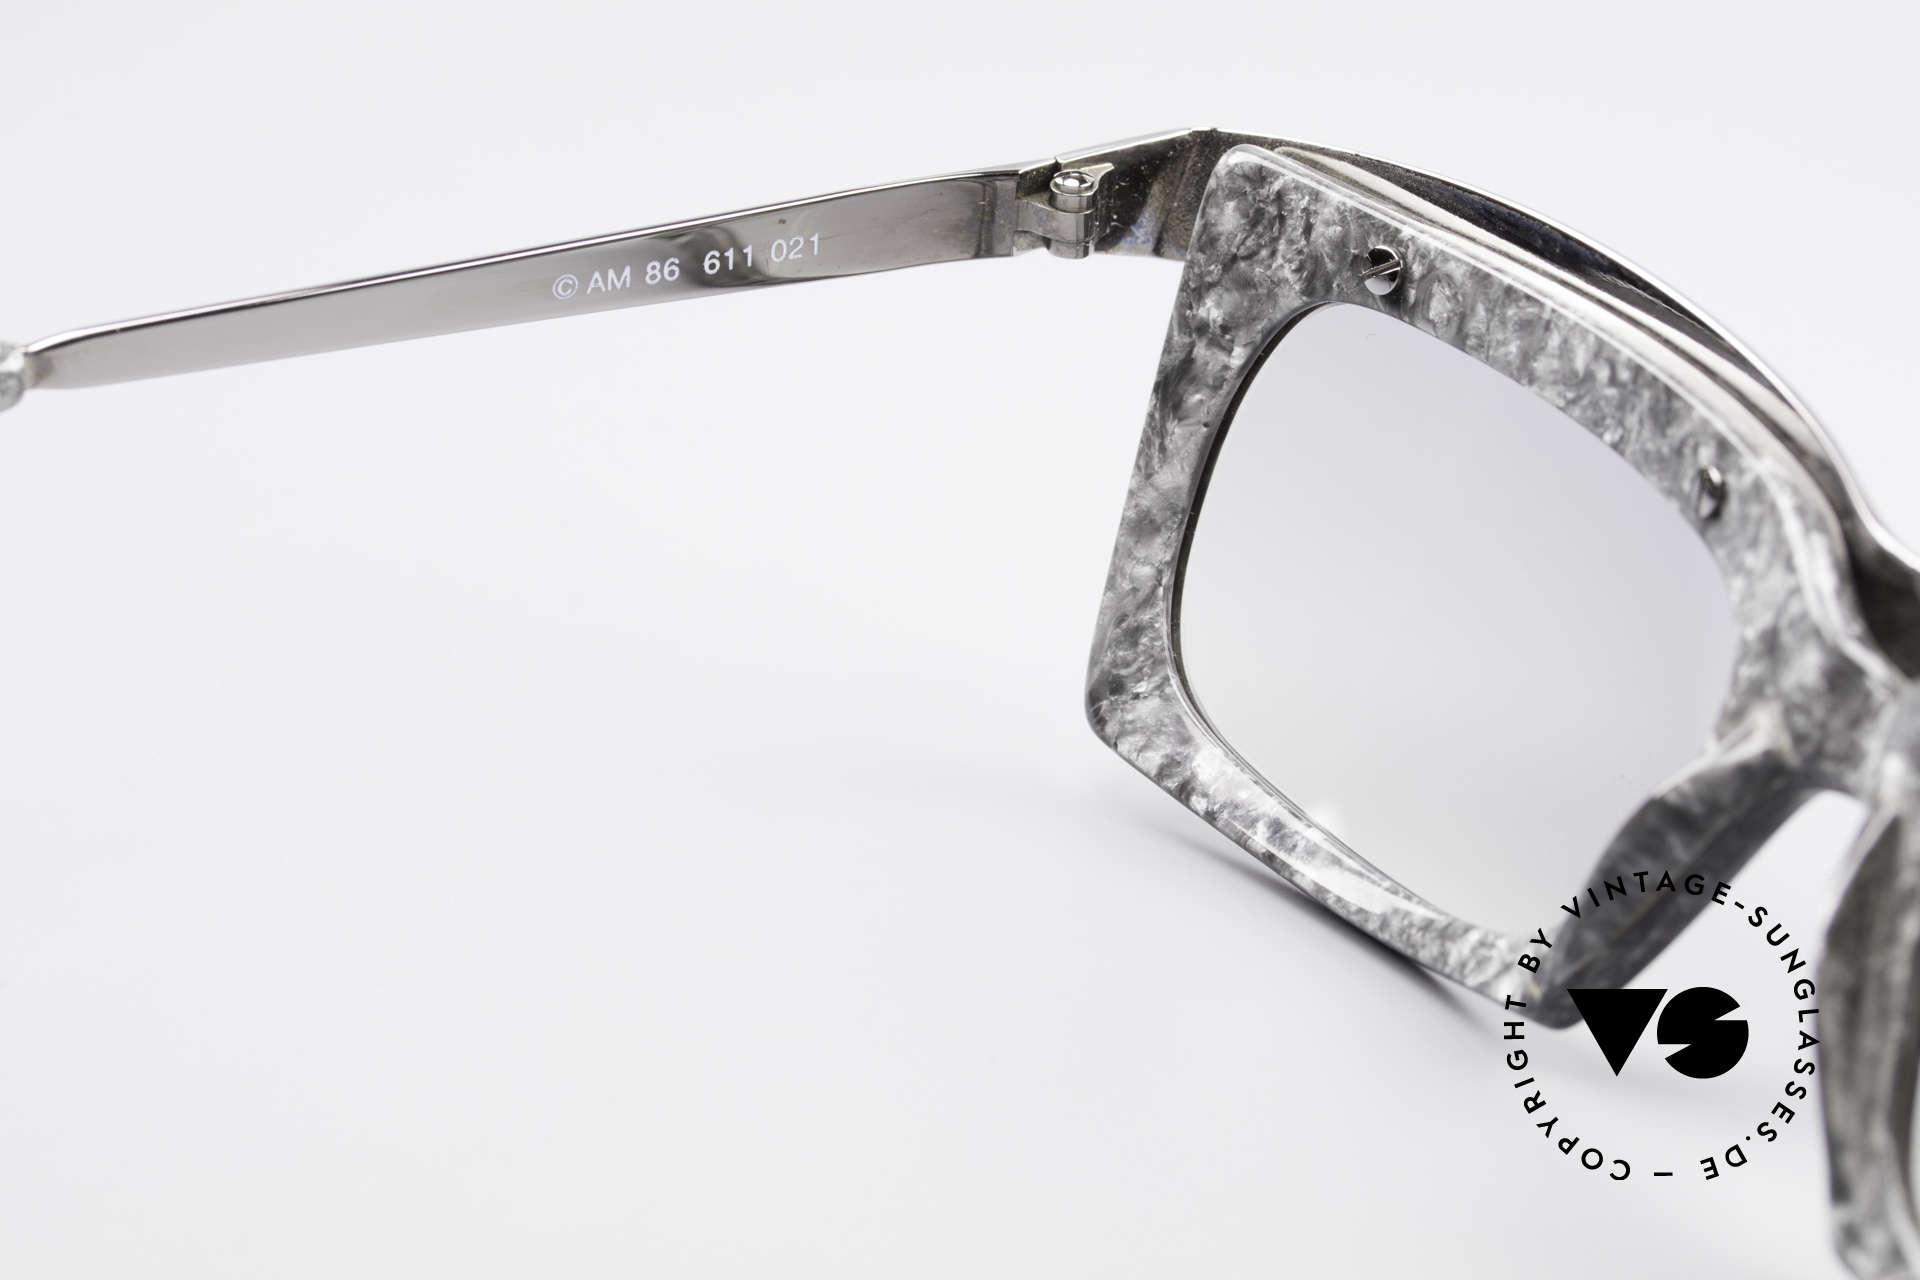 Alain Mikli 611 / 021 Spectacular 80's Sunglasses, NO retro specs, but a precious 30 years old ORIGINAL, Made for Men and Women